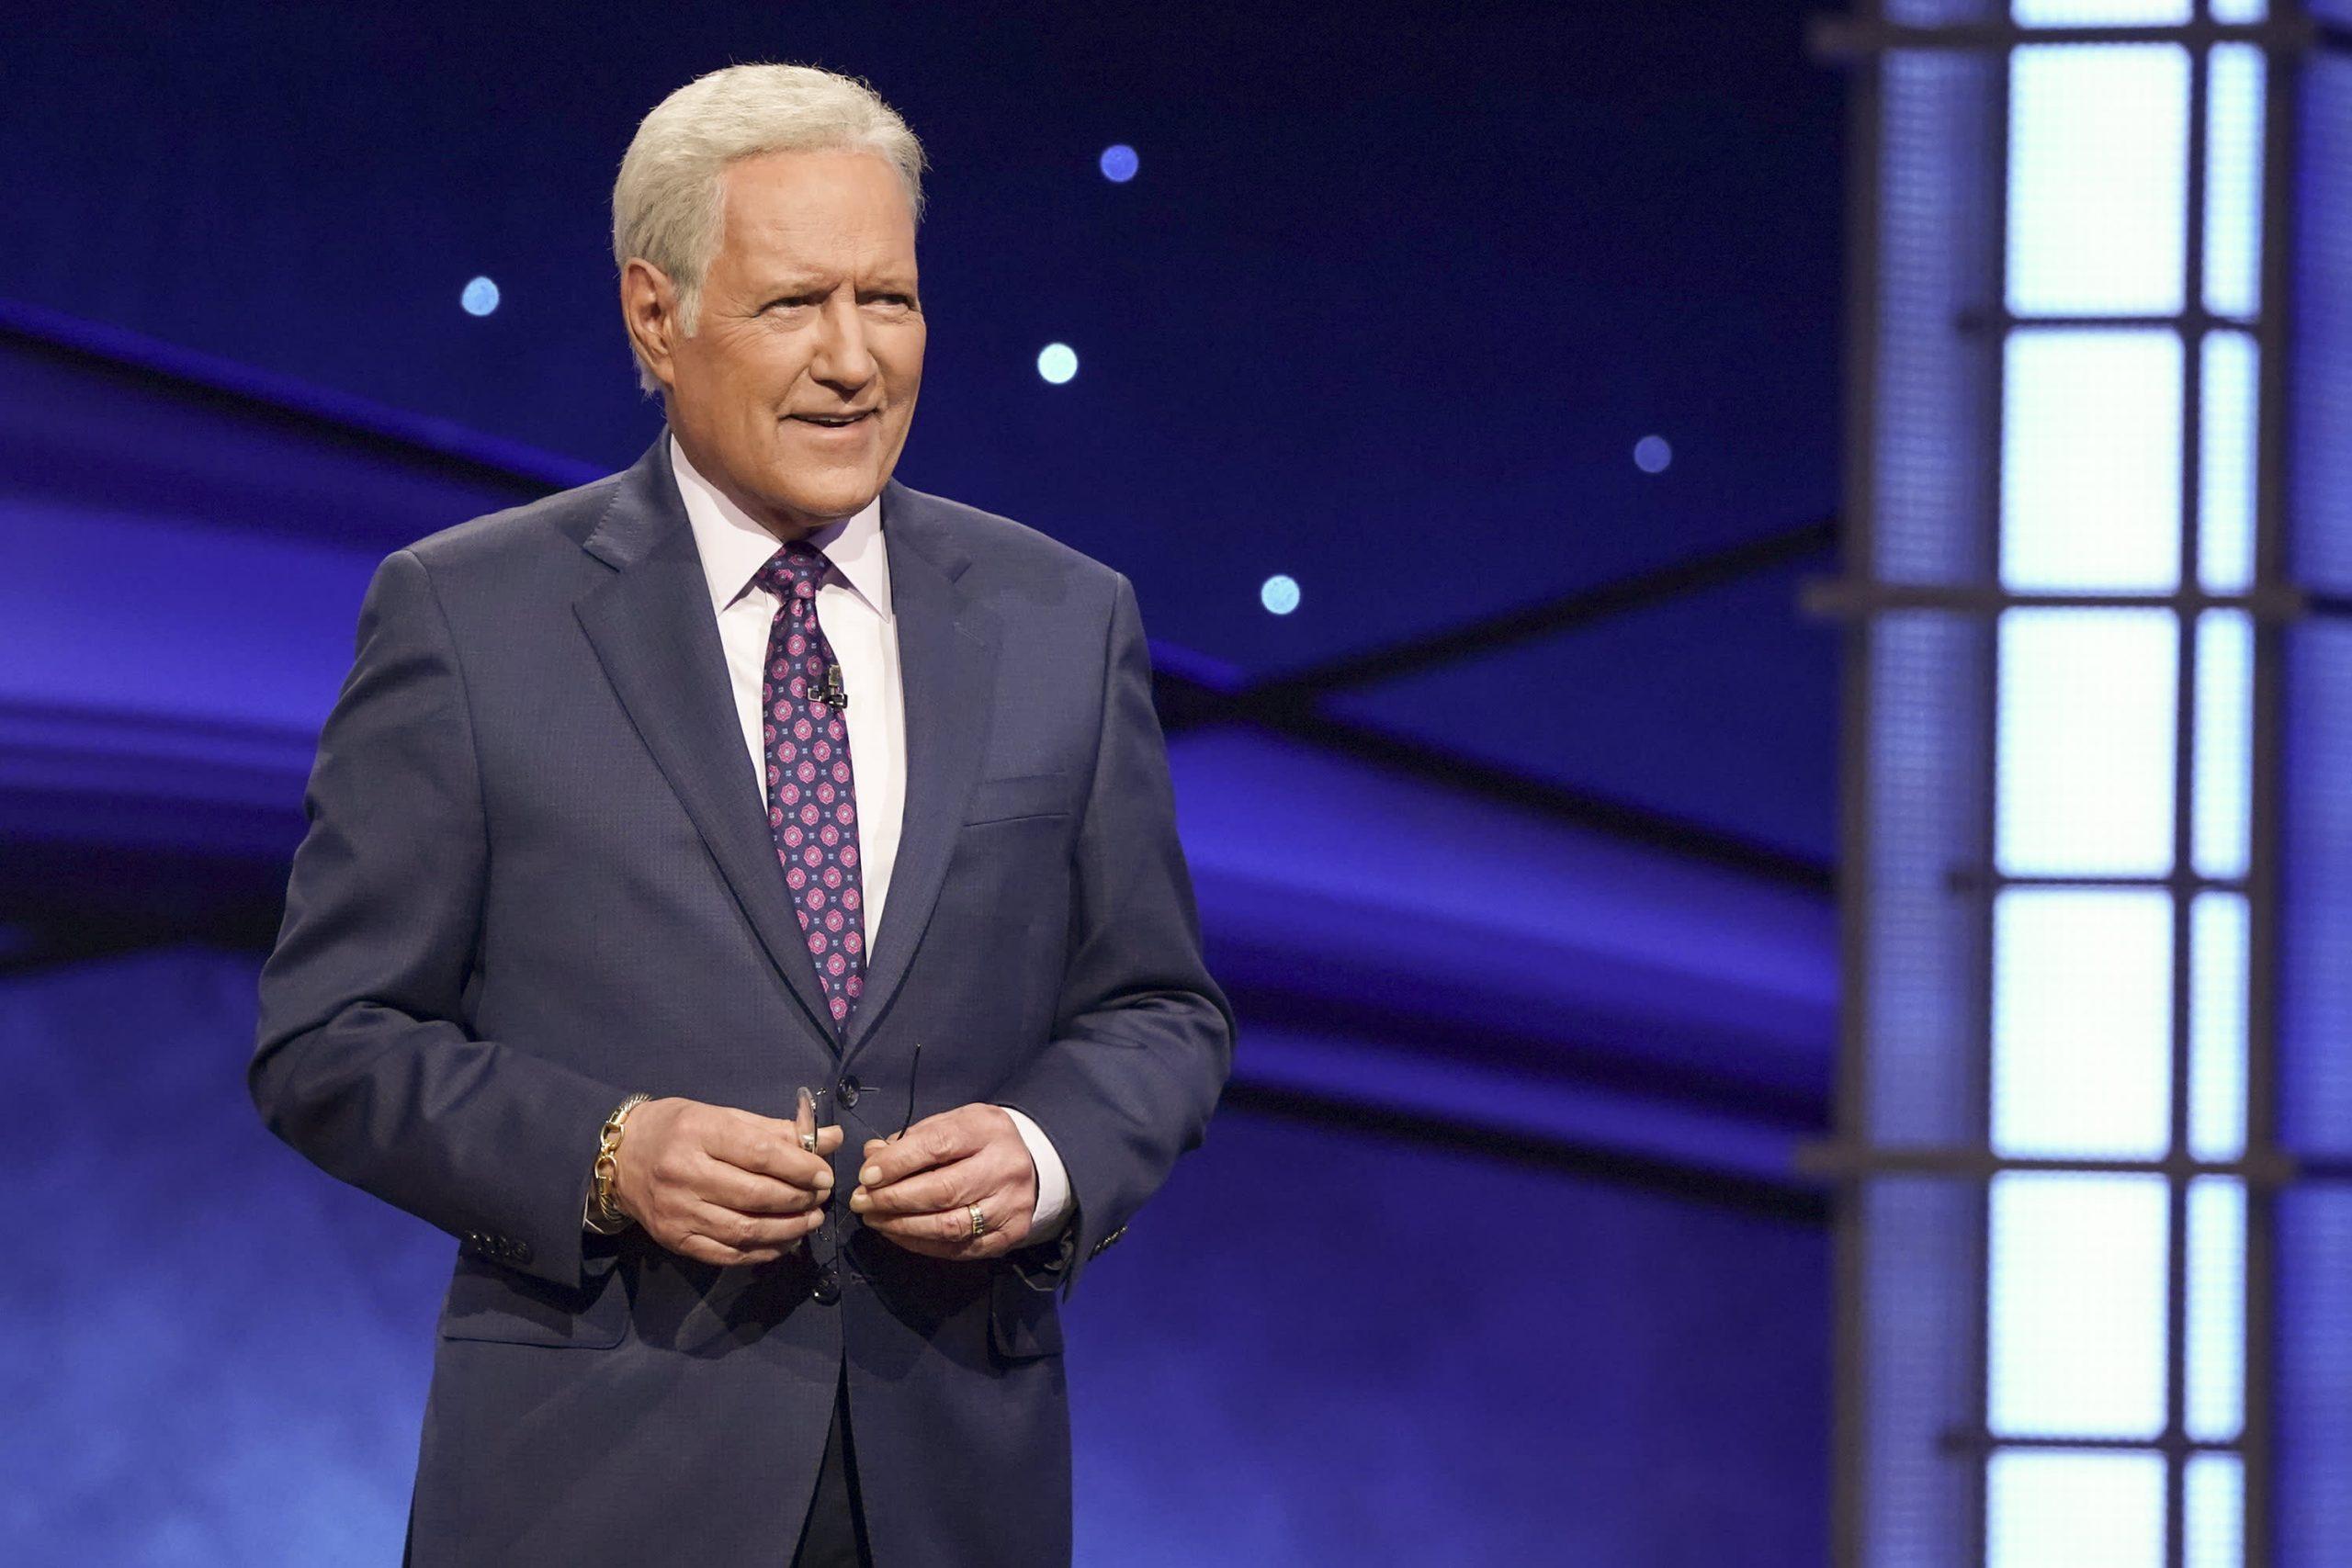 alex-trebeks-final-jeopardy-episode-contestant-on-hosts-tenacity